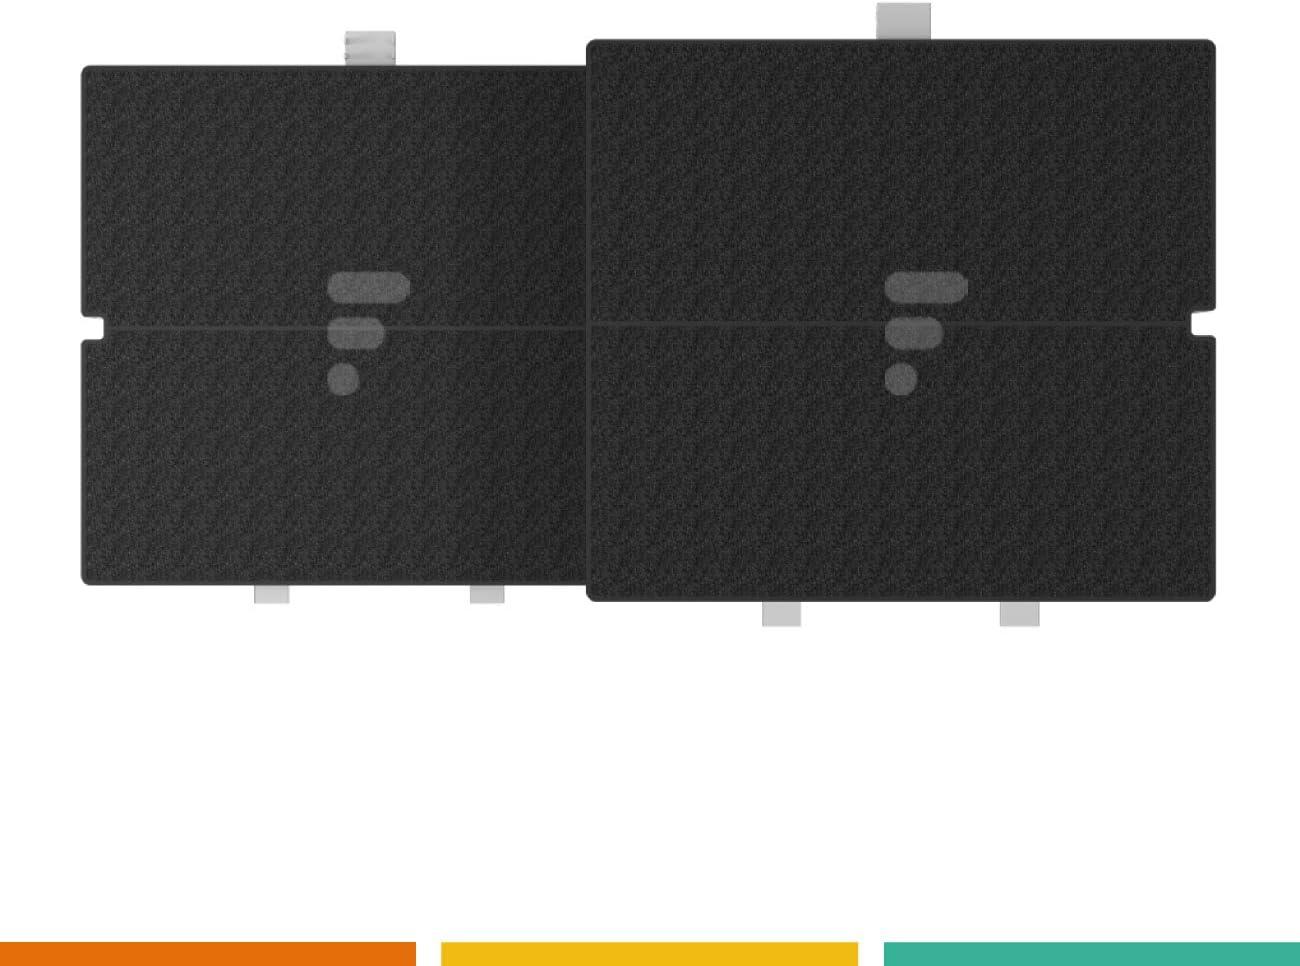 Filtro de campana Type FC22 – Compatible BSH 00361047 Bosch dhz5136 Siemens LZ51351: Amazon.es: Grandes electrodomésticos